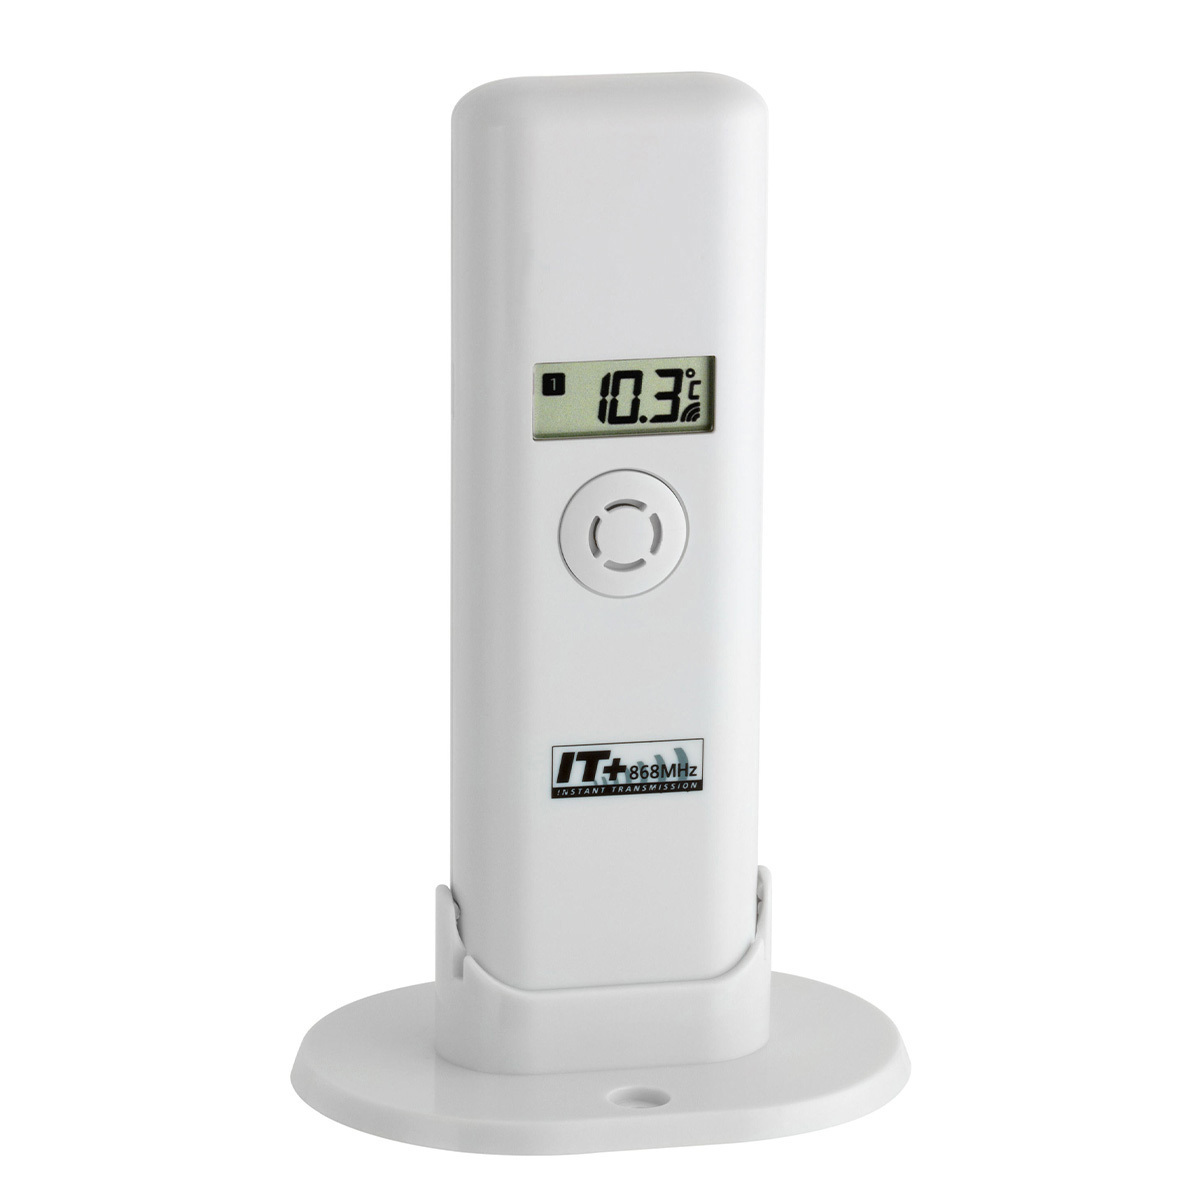 30-3053-it-funk-poolthermometer-malibu-sender1-1200x1200px.jpg